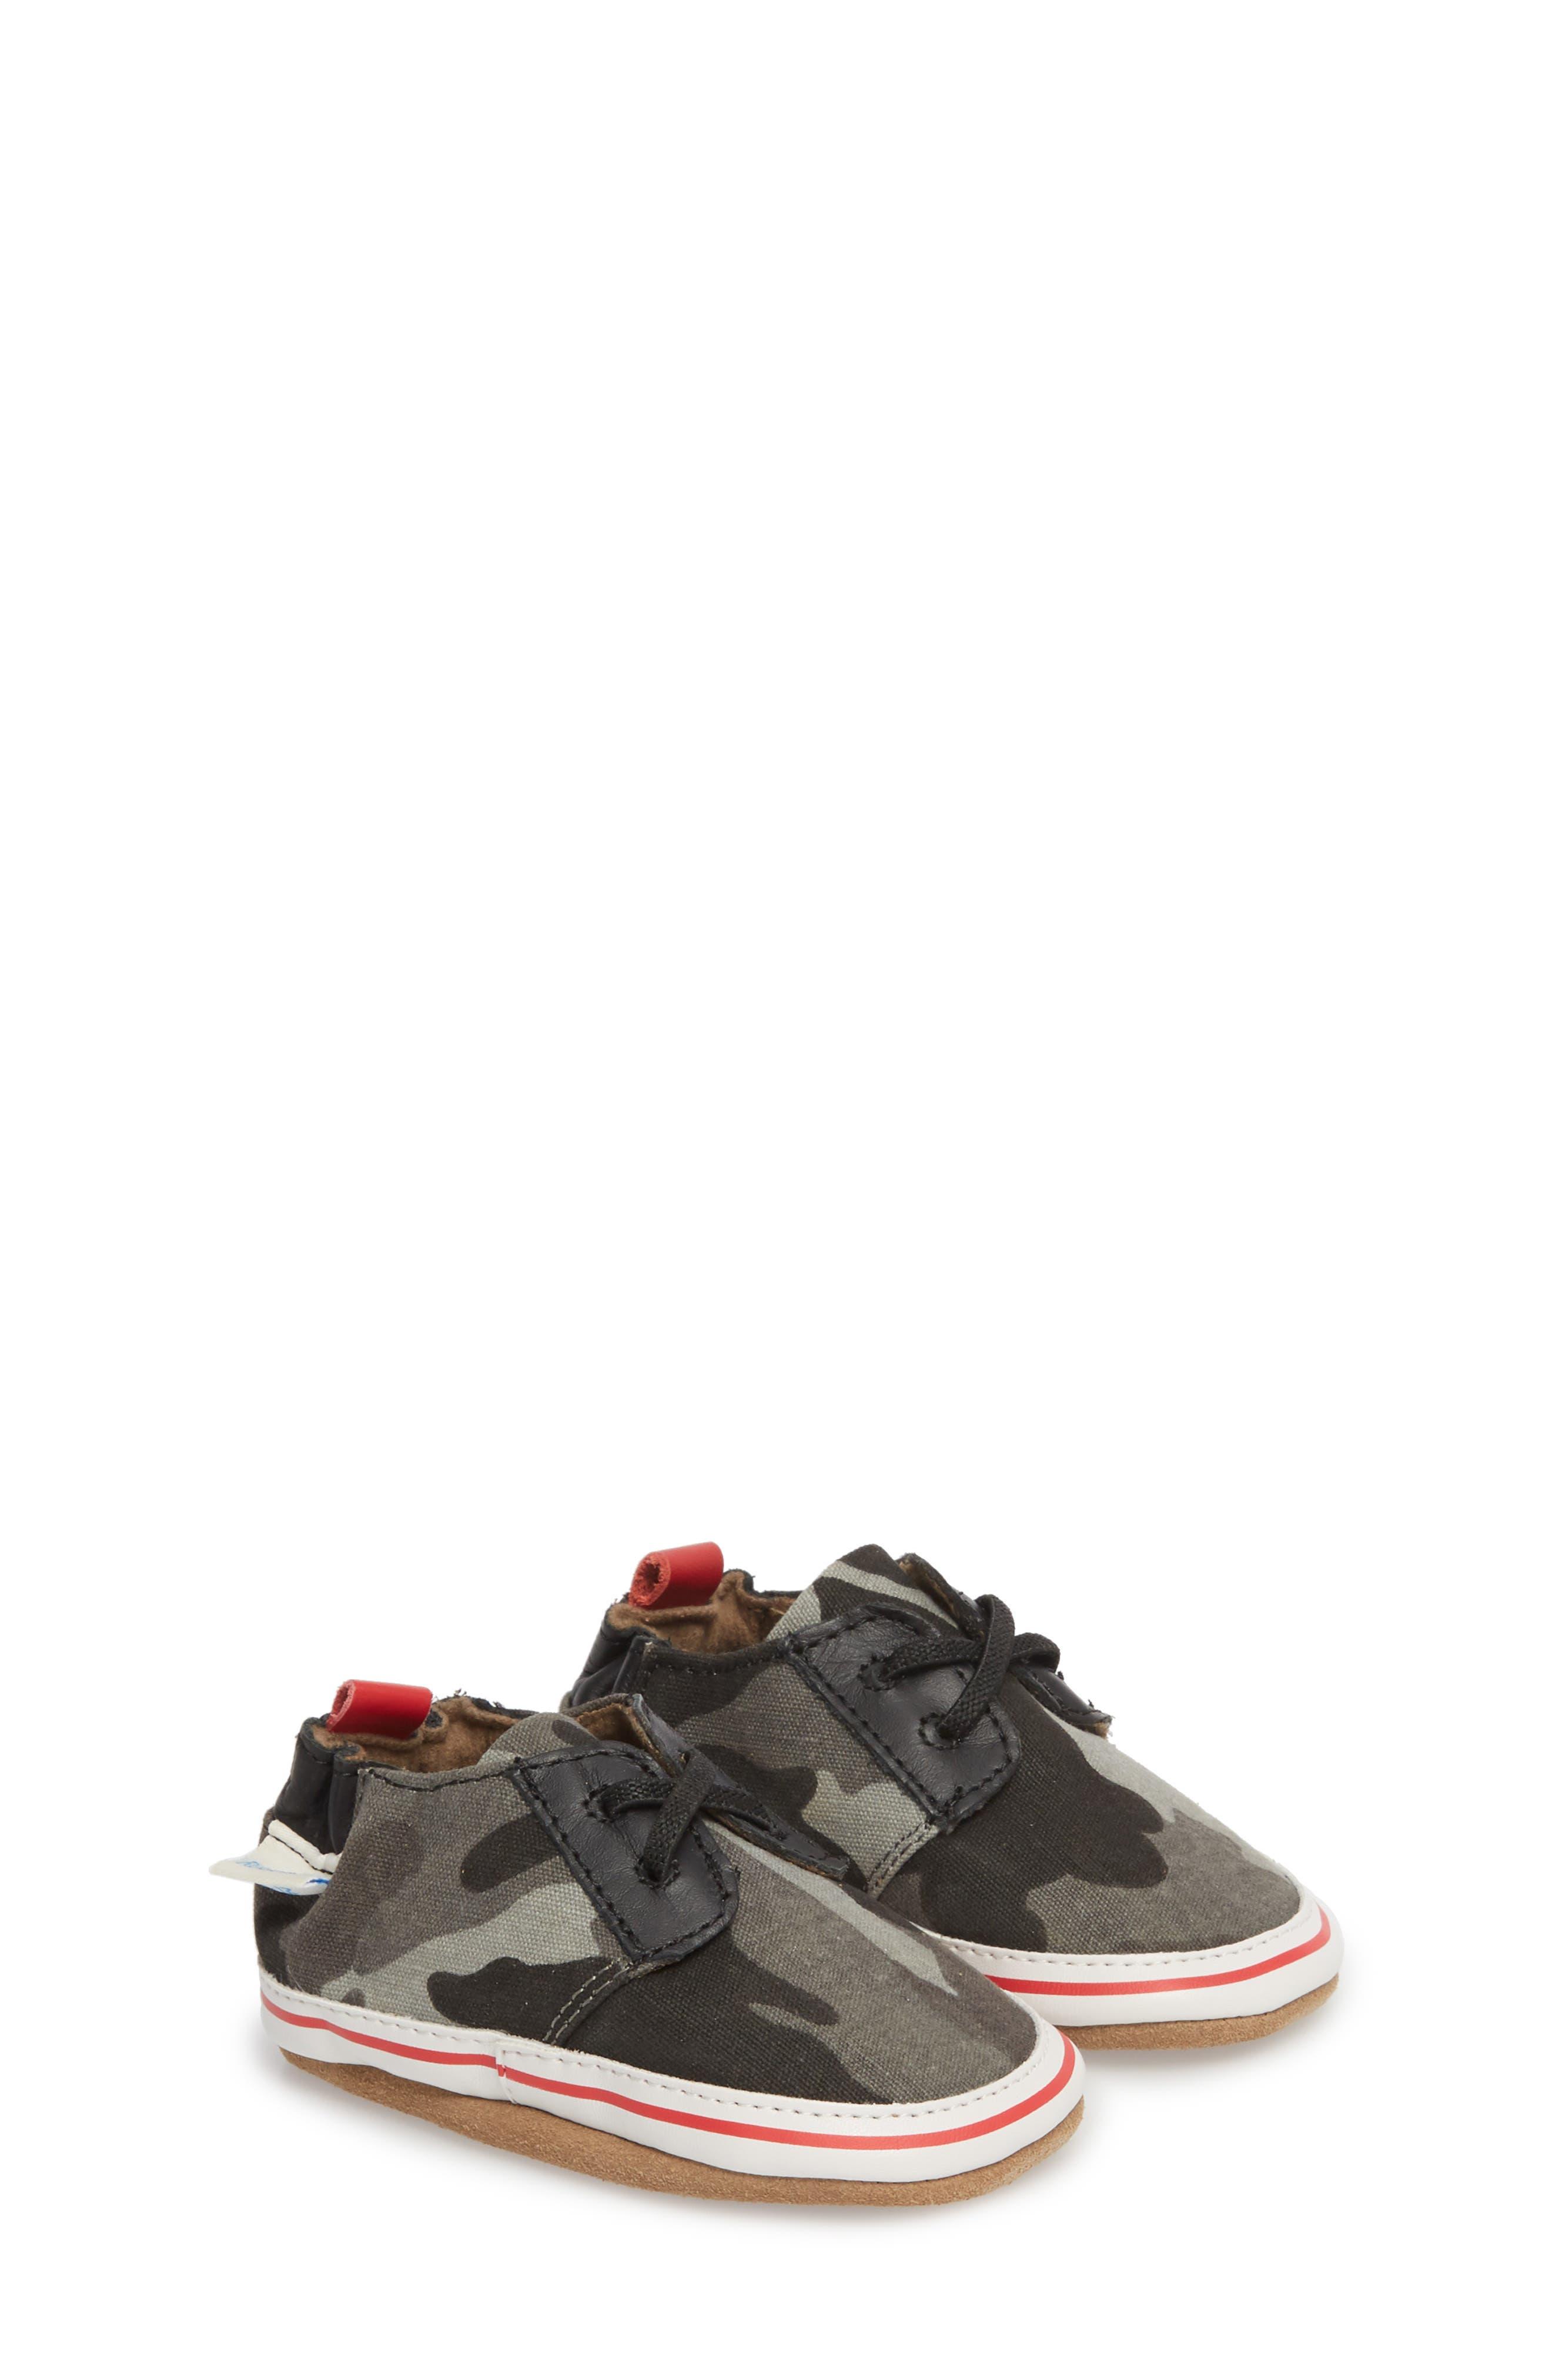 Cool & Casual Camo Print Crib Shoe,                         Main,                         color, Grey